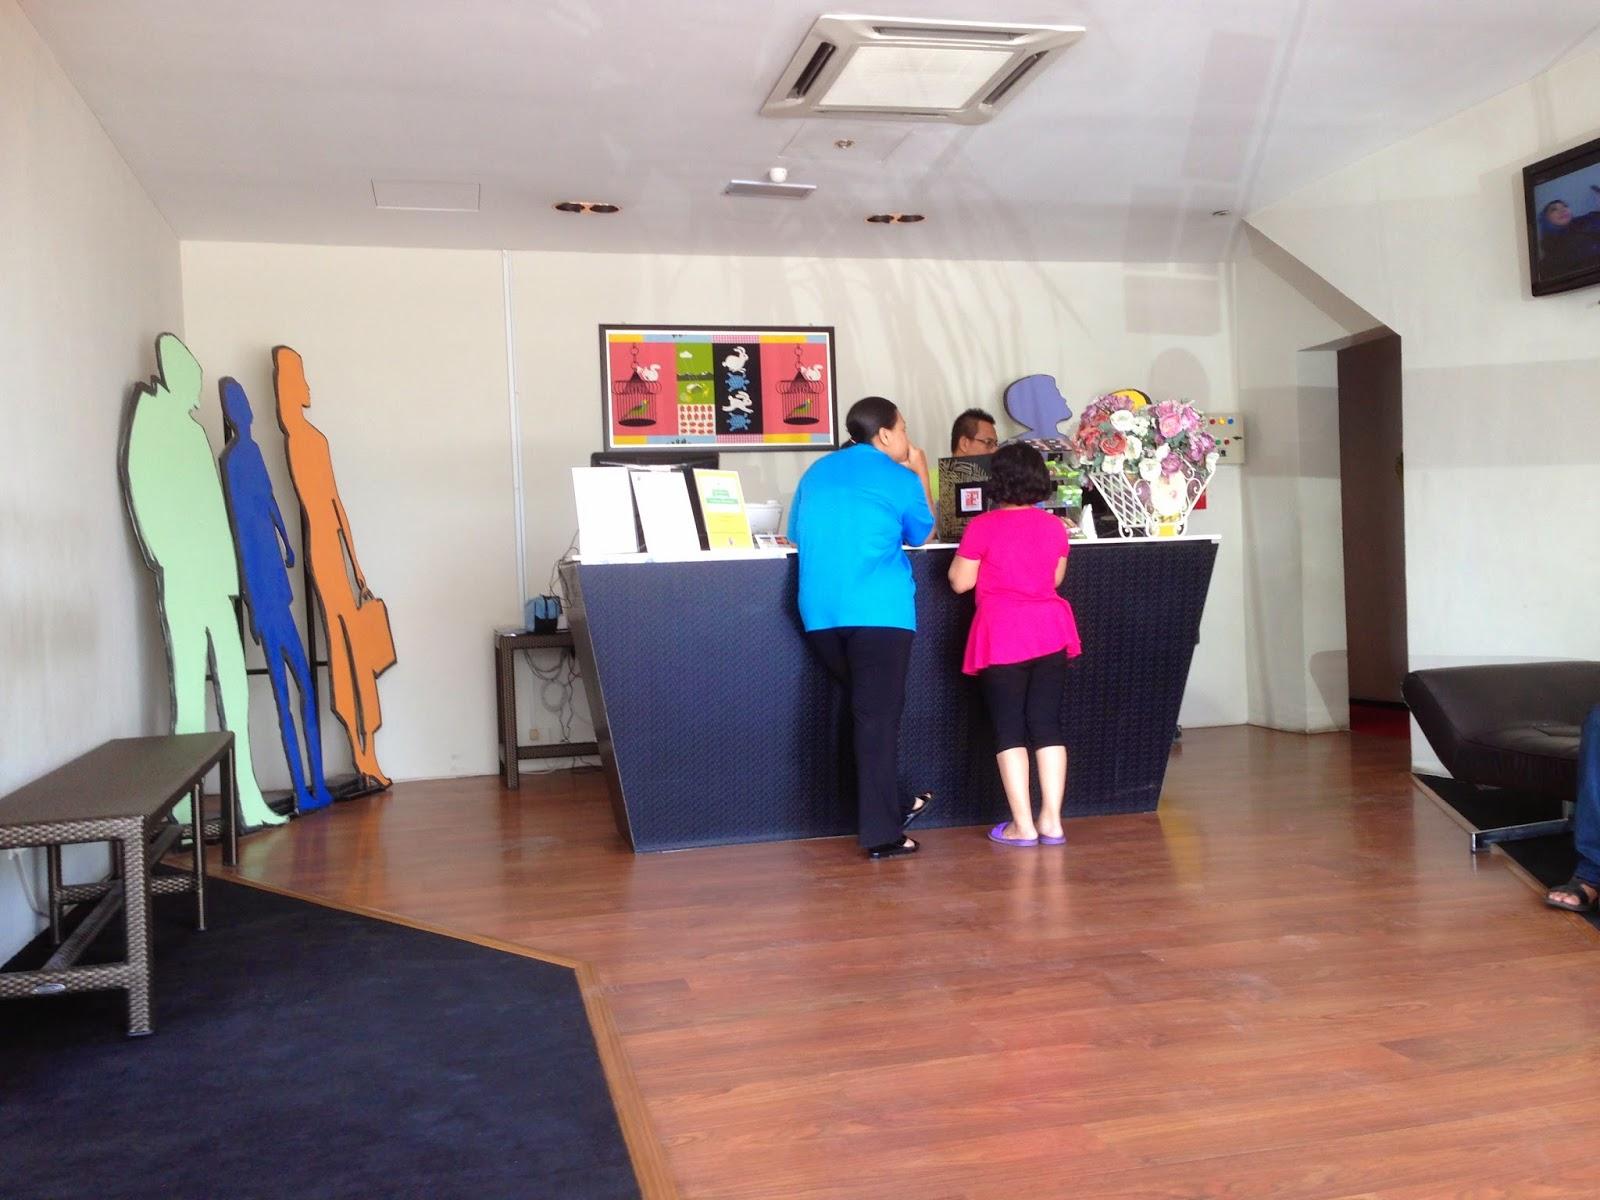 Zoom Inn Boutique Hotel reception area